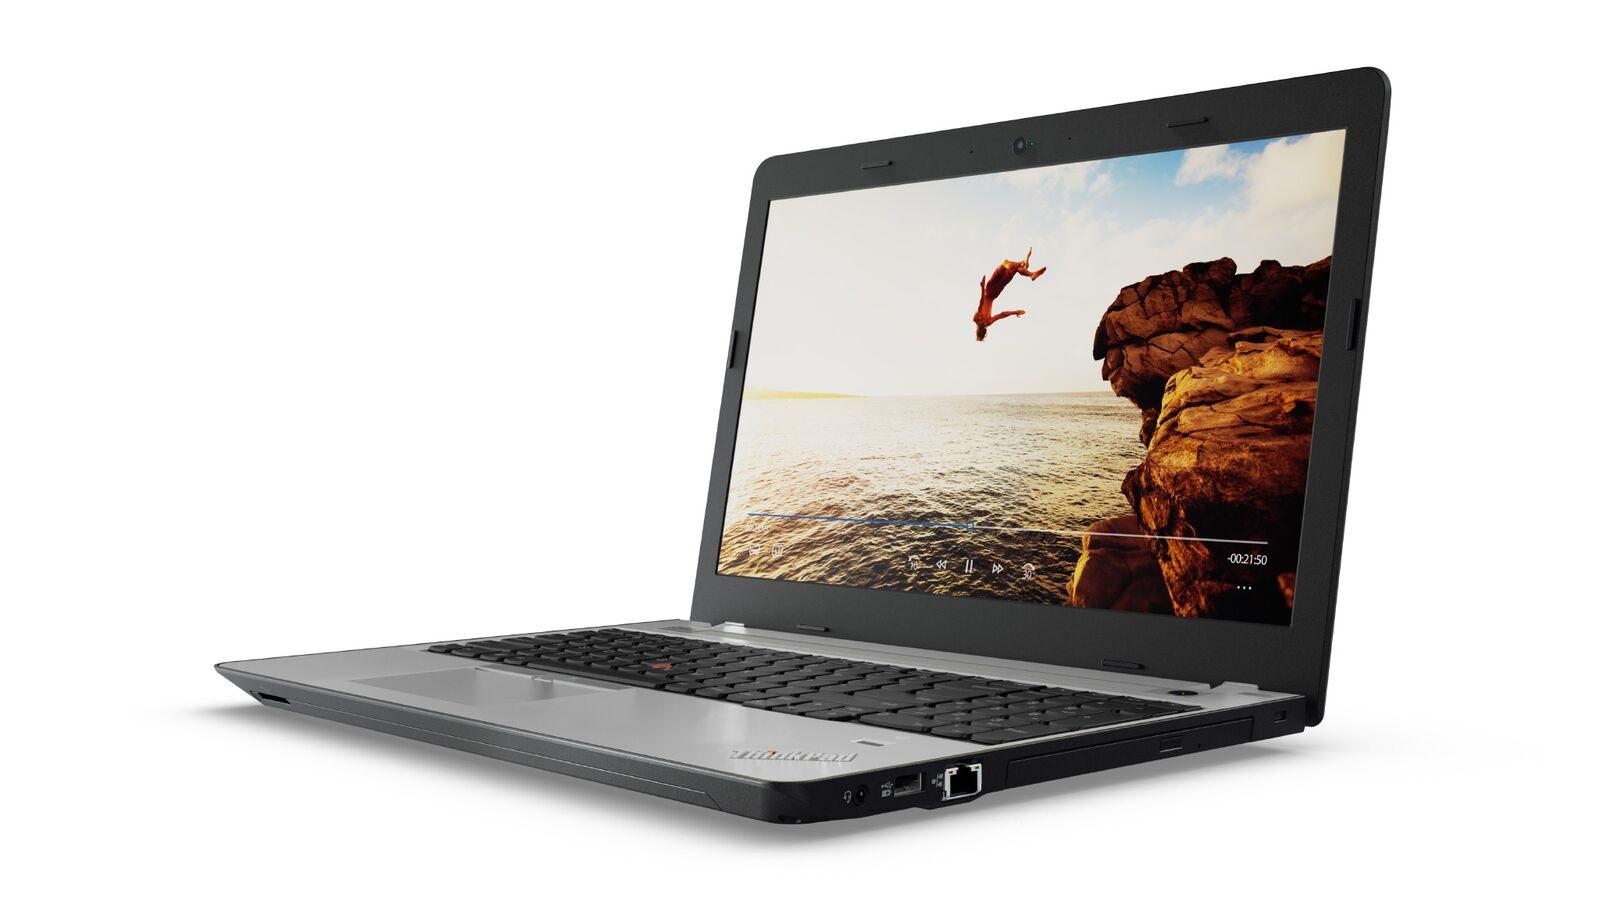 "Lenovo ThinkPad E570 i3-6006U/8GB/256GB SSD/DVD±RW/HD Graphics 520/15,6""FHD matný/Win10 černo-stříbrný"